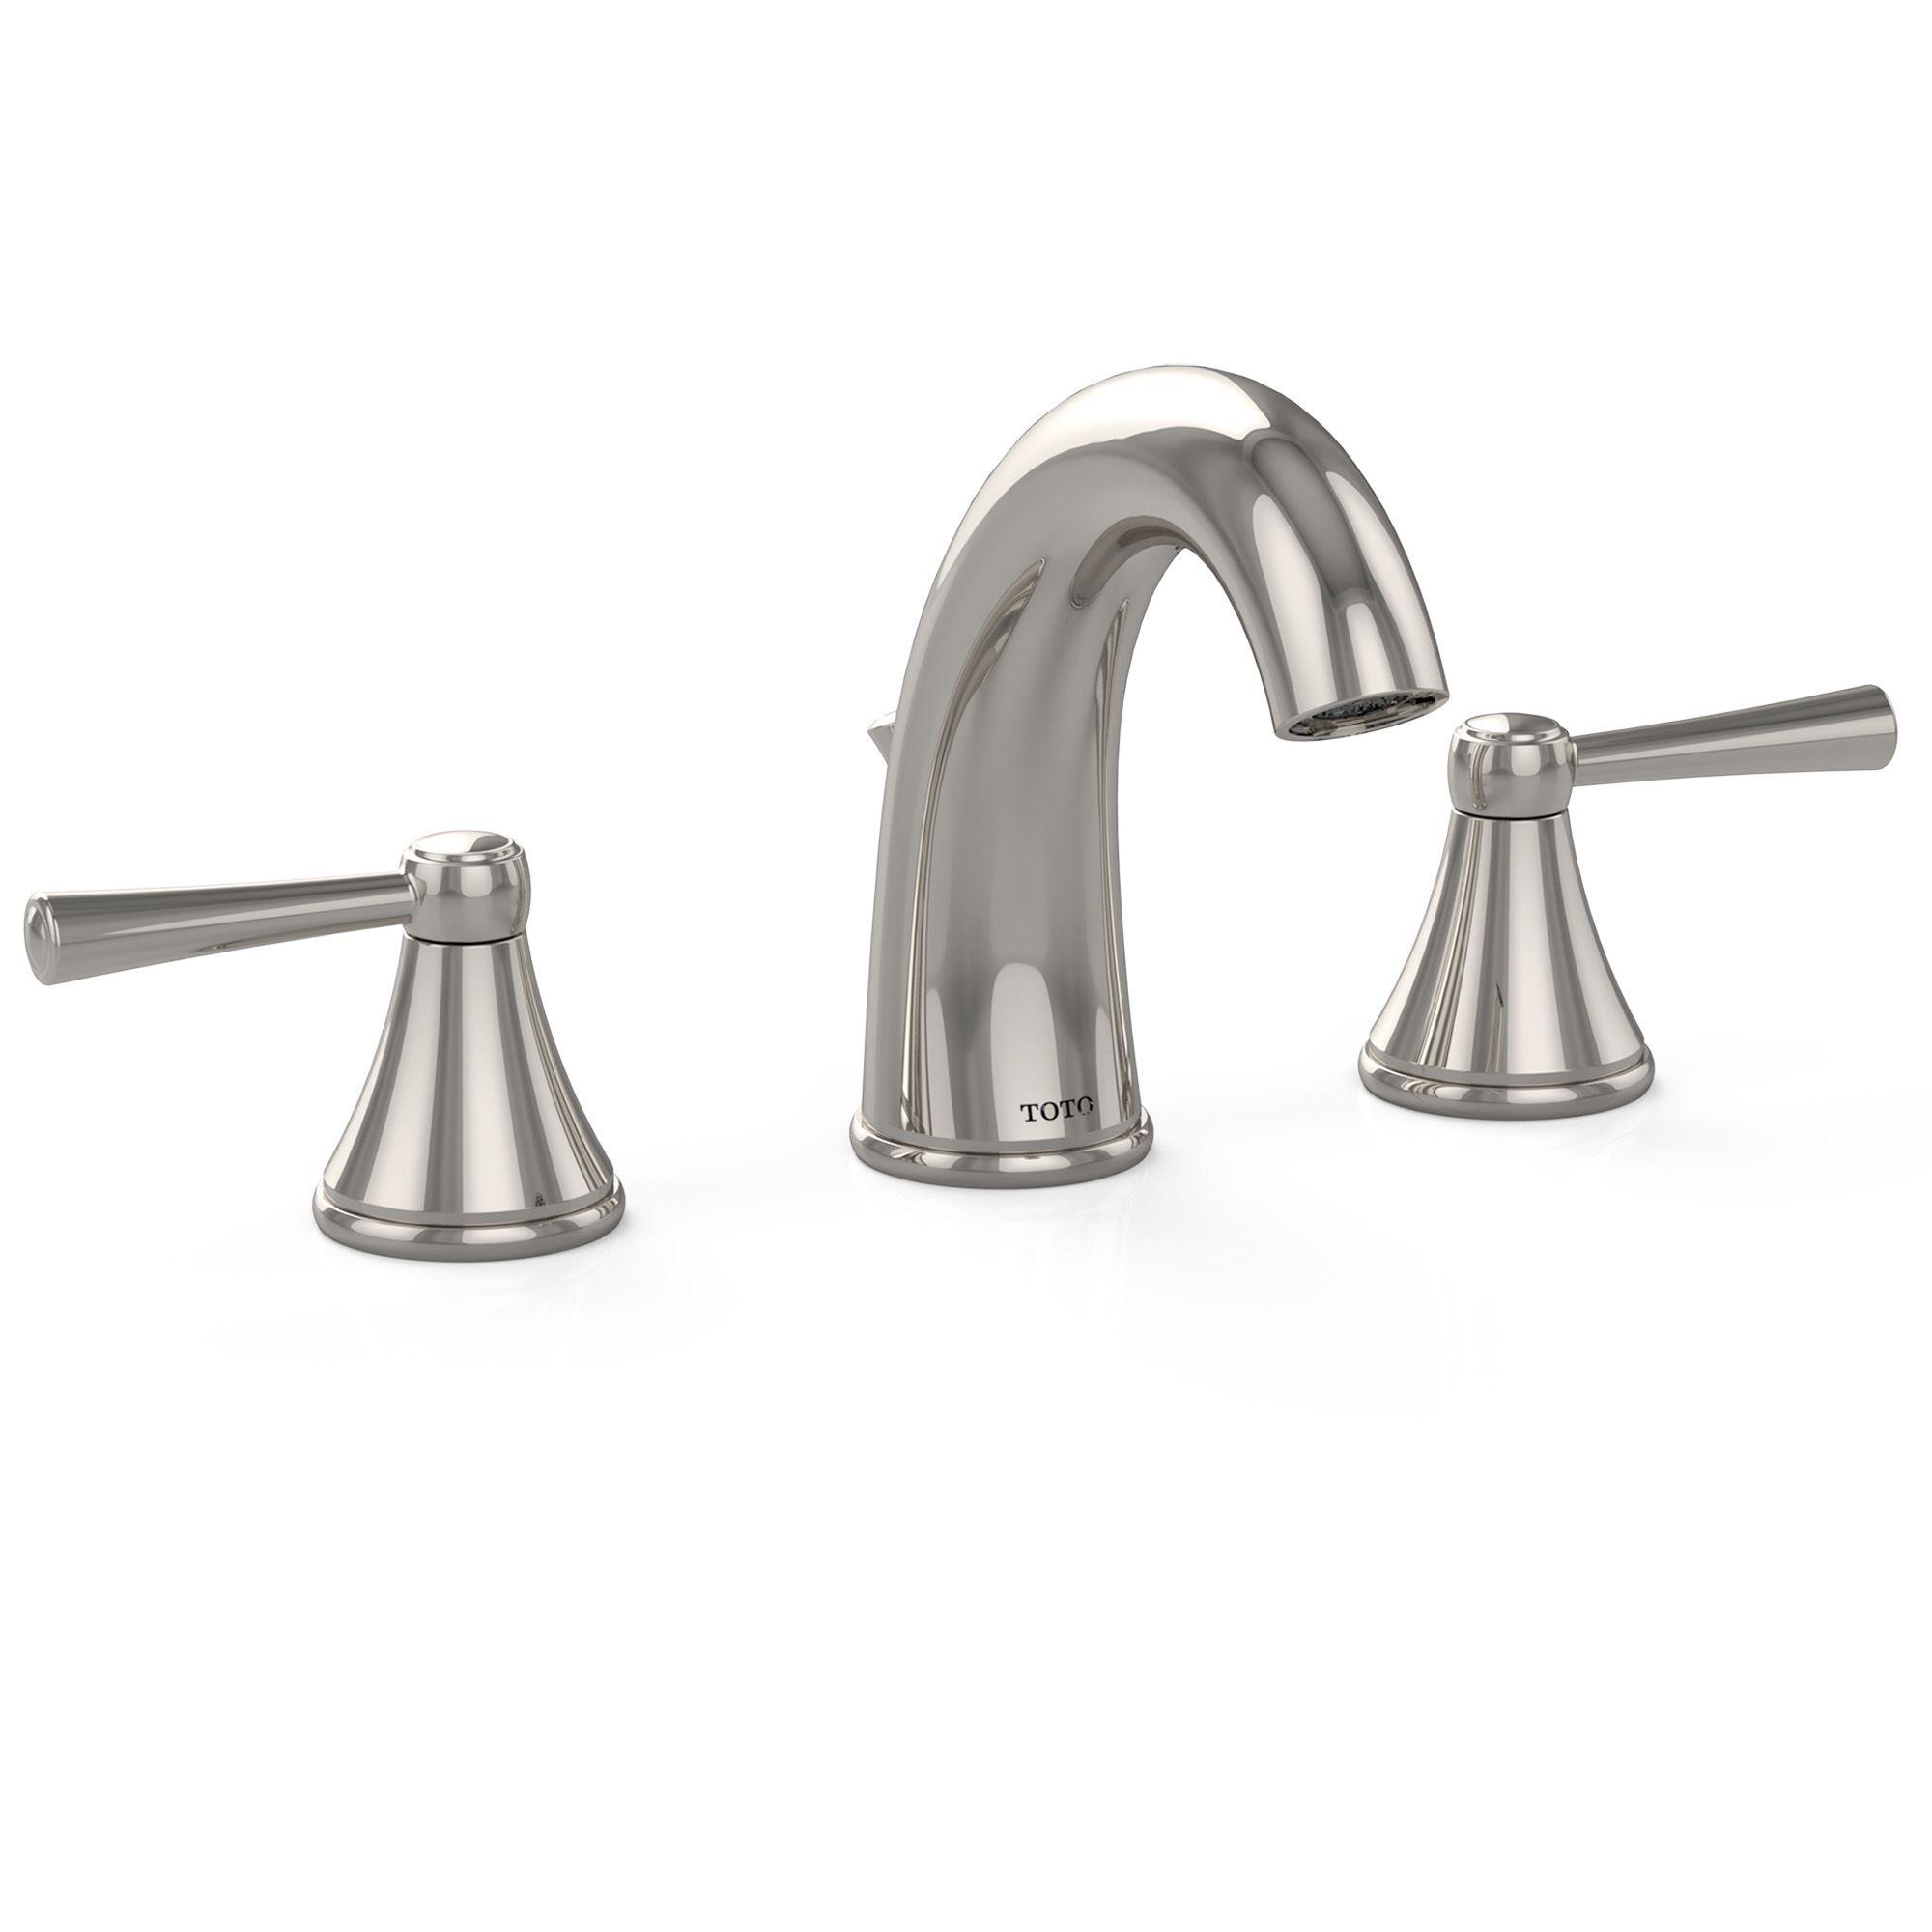 Brushed Nickel Sink Faucet Waterfall Bathroom Mixer Tap Deck